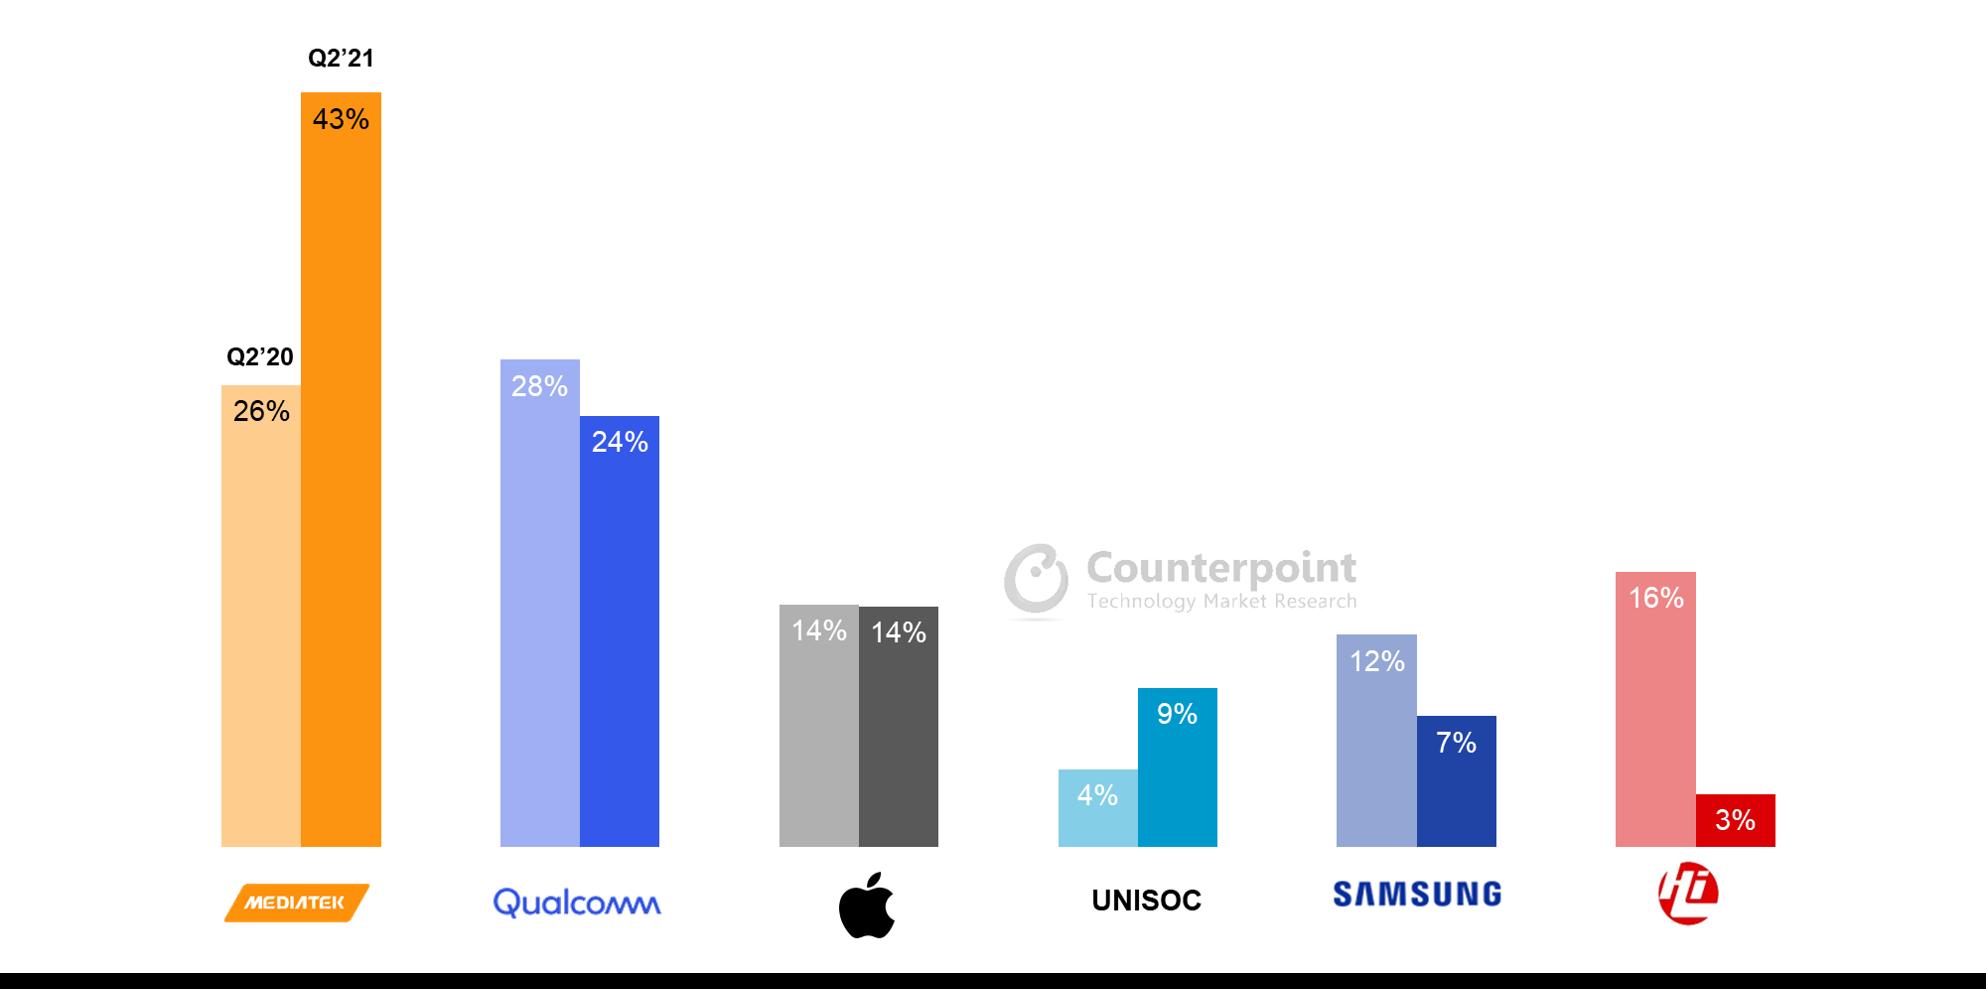 Global Smartphone APSoC Shipment Market Share Q2 2020 vs Q2 2021